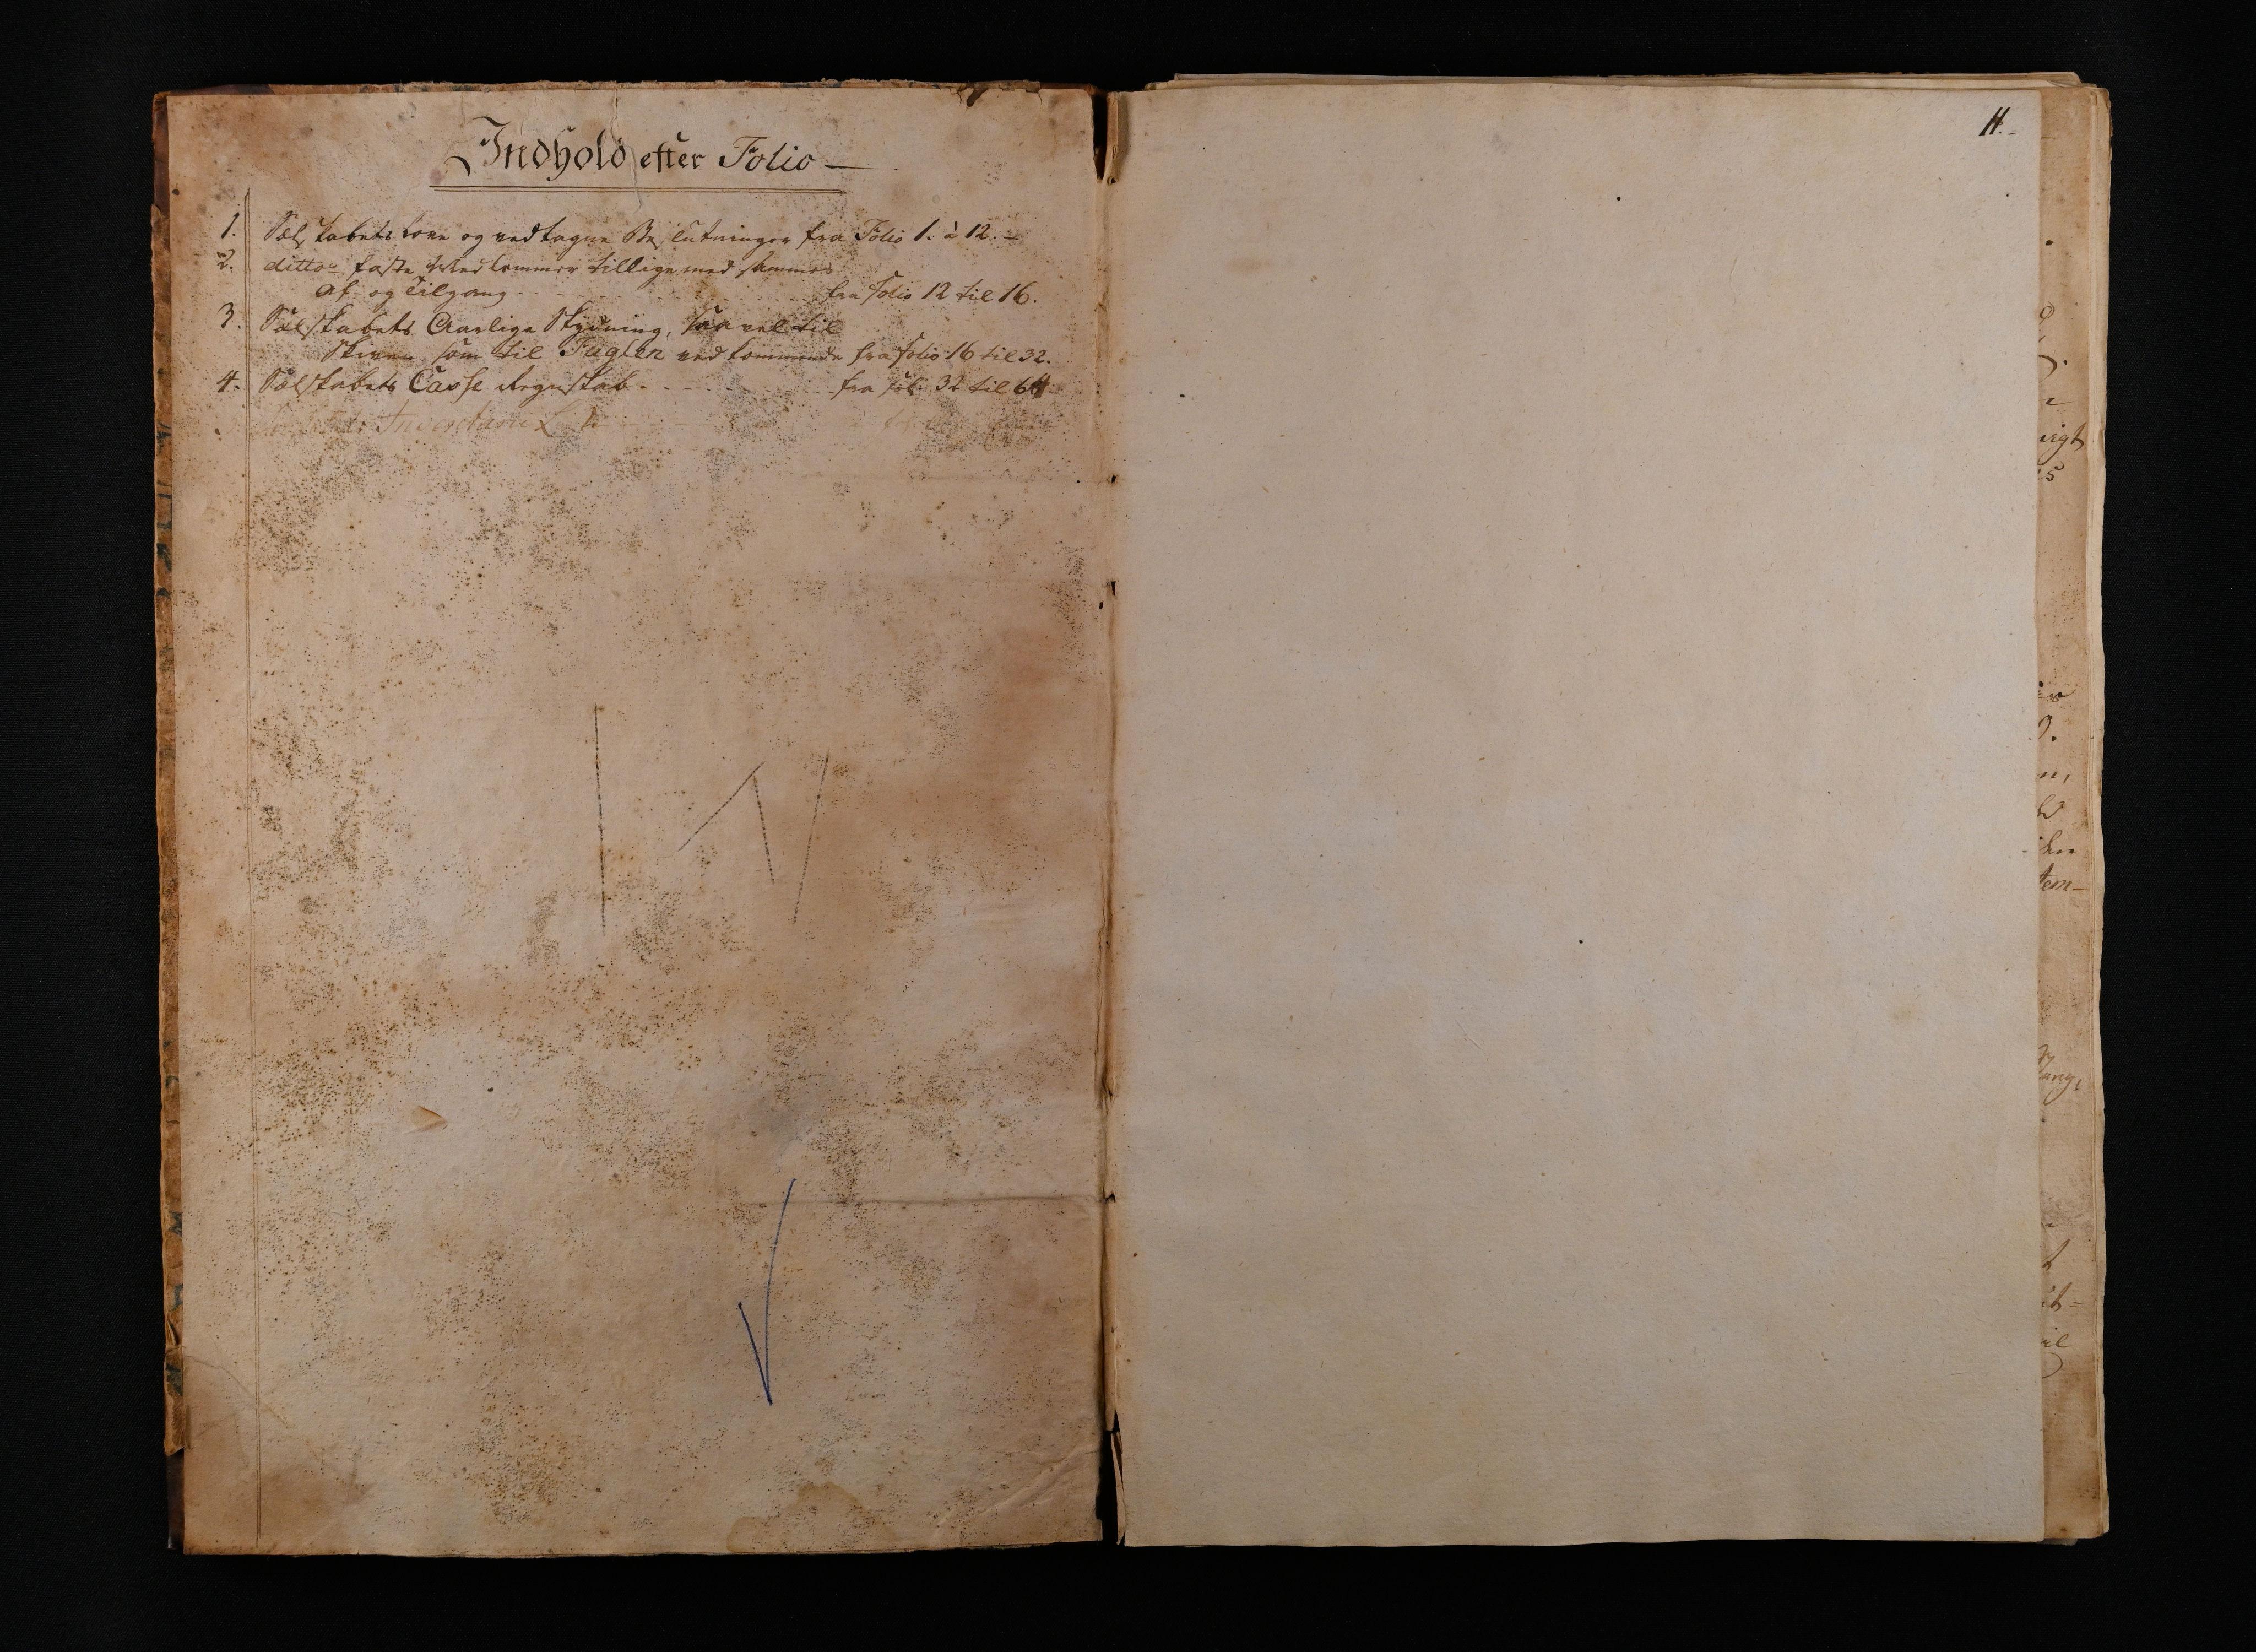 IKAO, Moss skytselskap, A/Aa/L0001: Møtebok med regnskap, 1801-1806, 1801-1806